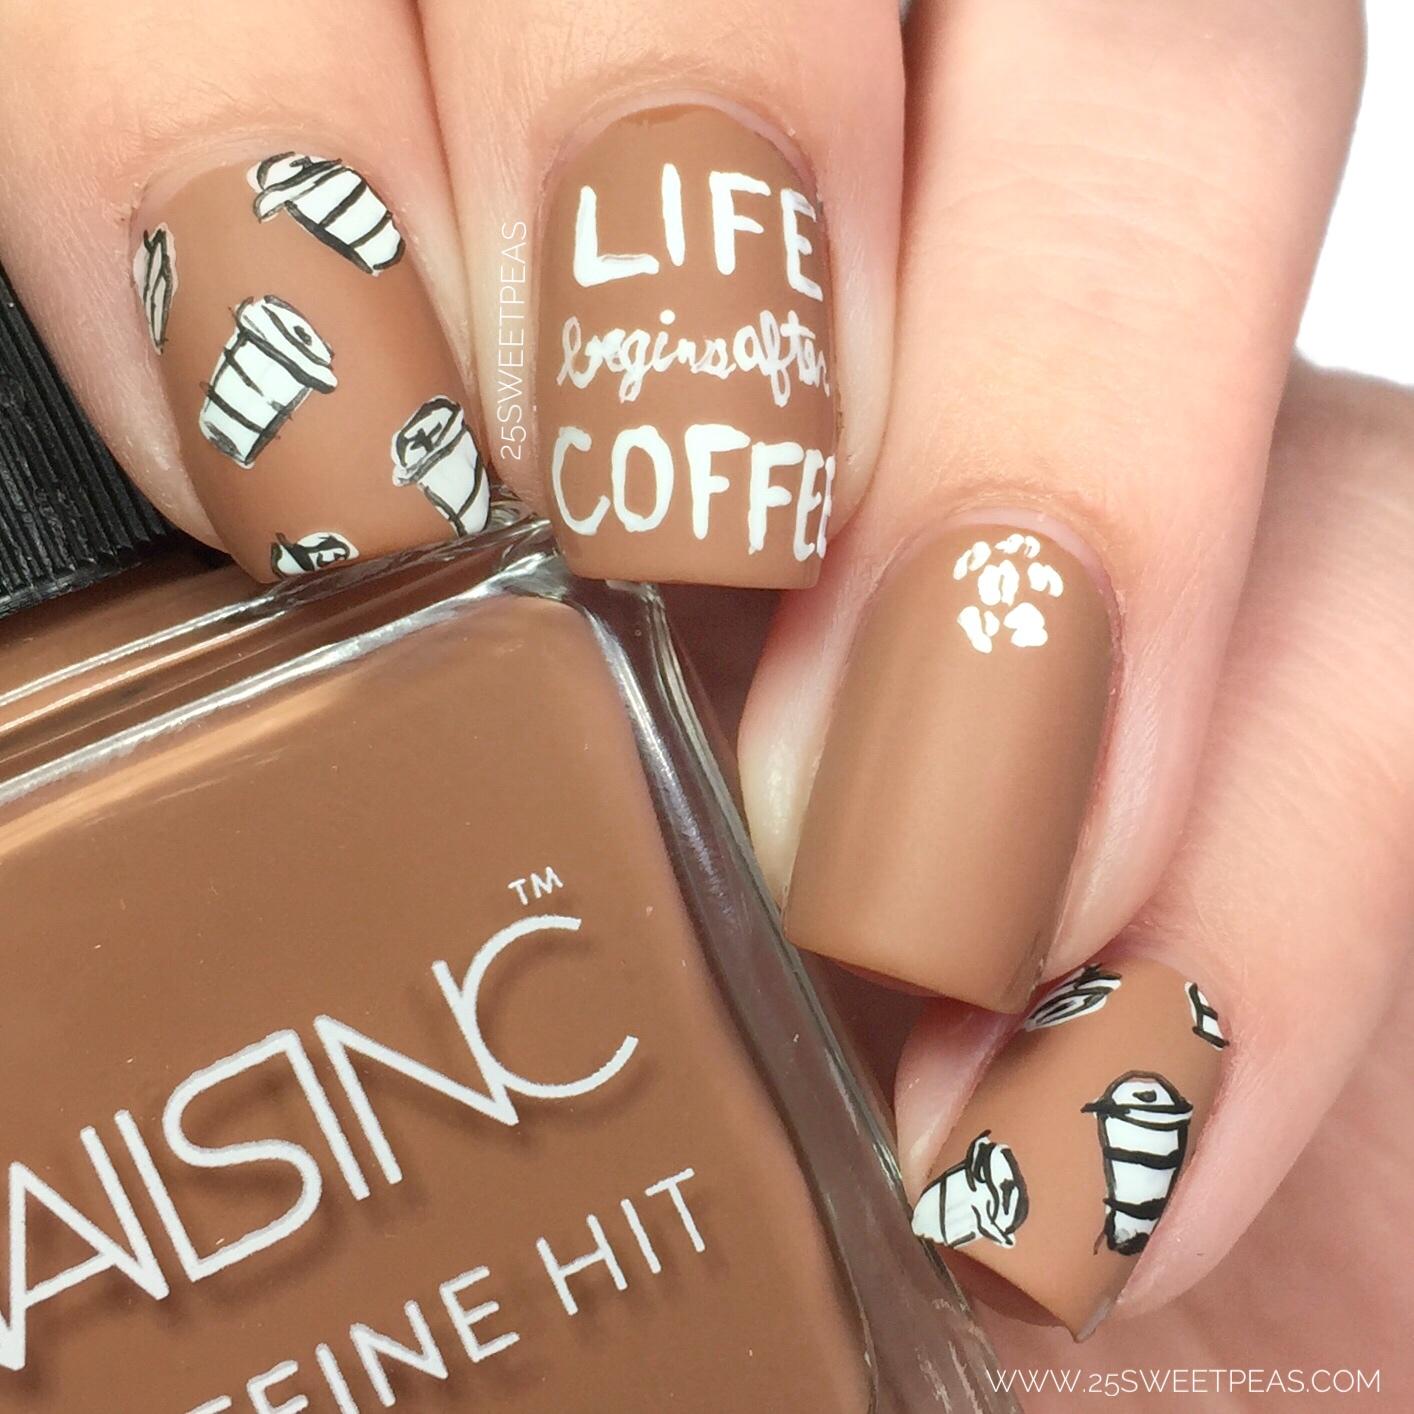 Nails Inc Caffeine Hit National Coffee Day Nail Art 25 Sweetpeas